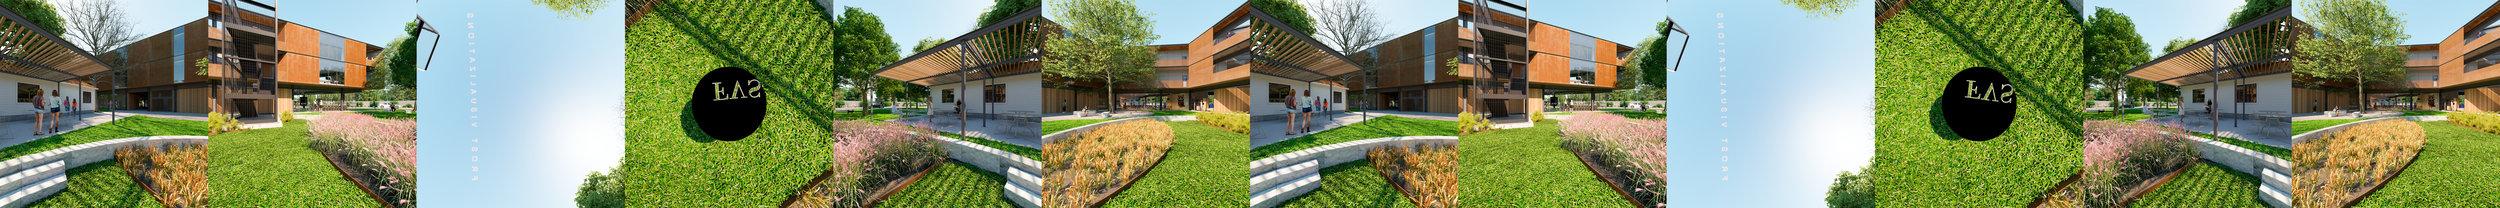 180304_Bercy Chen Studio_Shady Lane Offices_Courtyard 01x.jpg